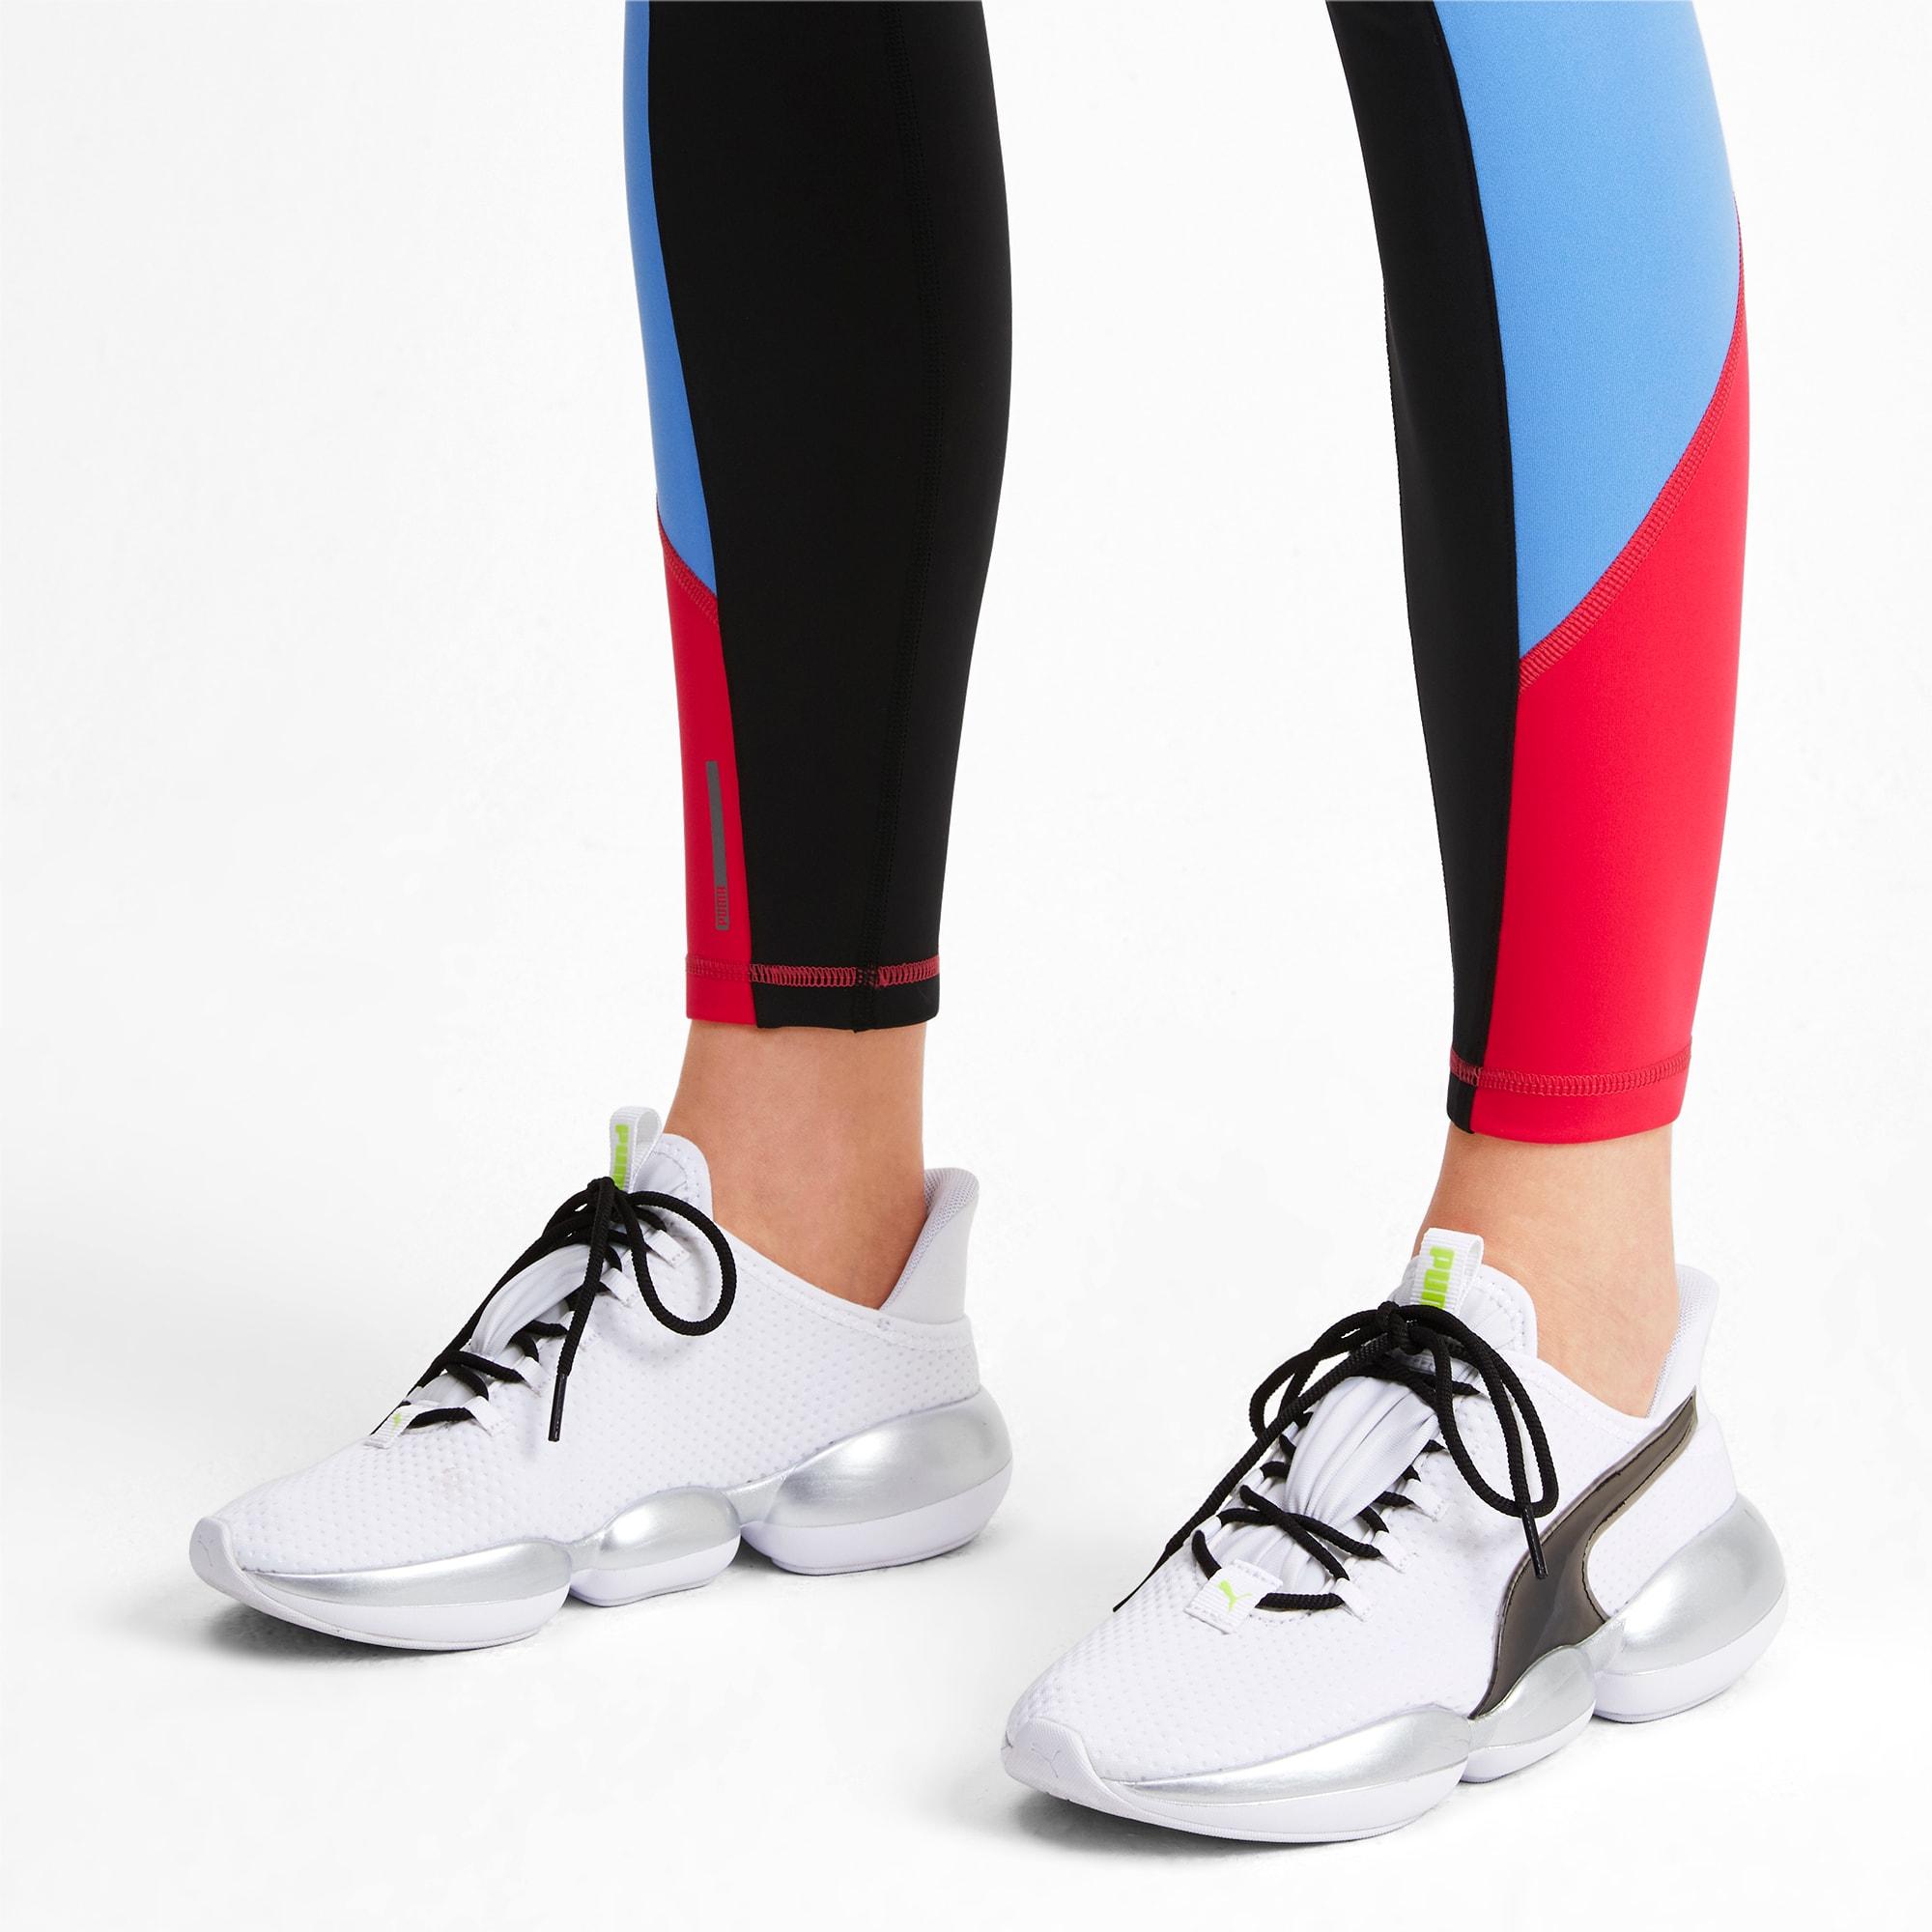 PUMA Mode XT Women's Training Sneakers Donna Scarpe